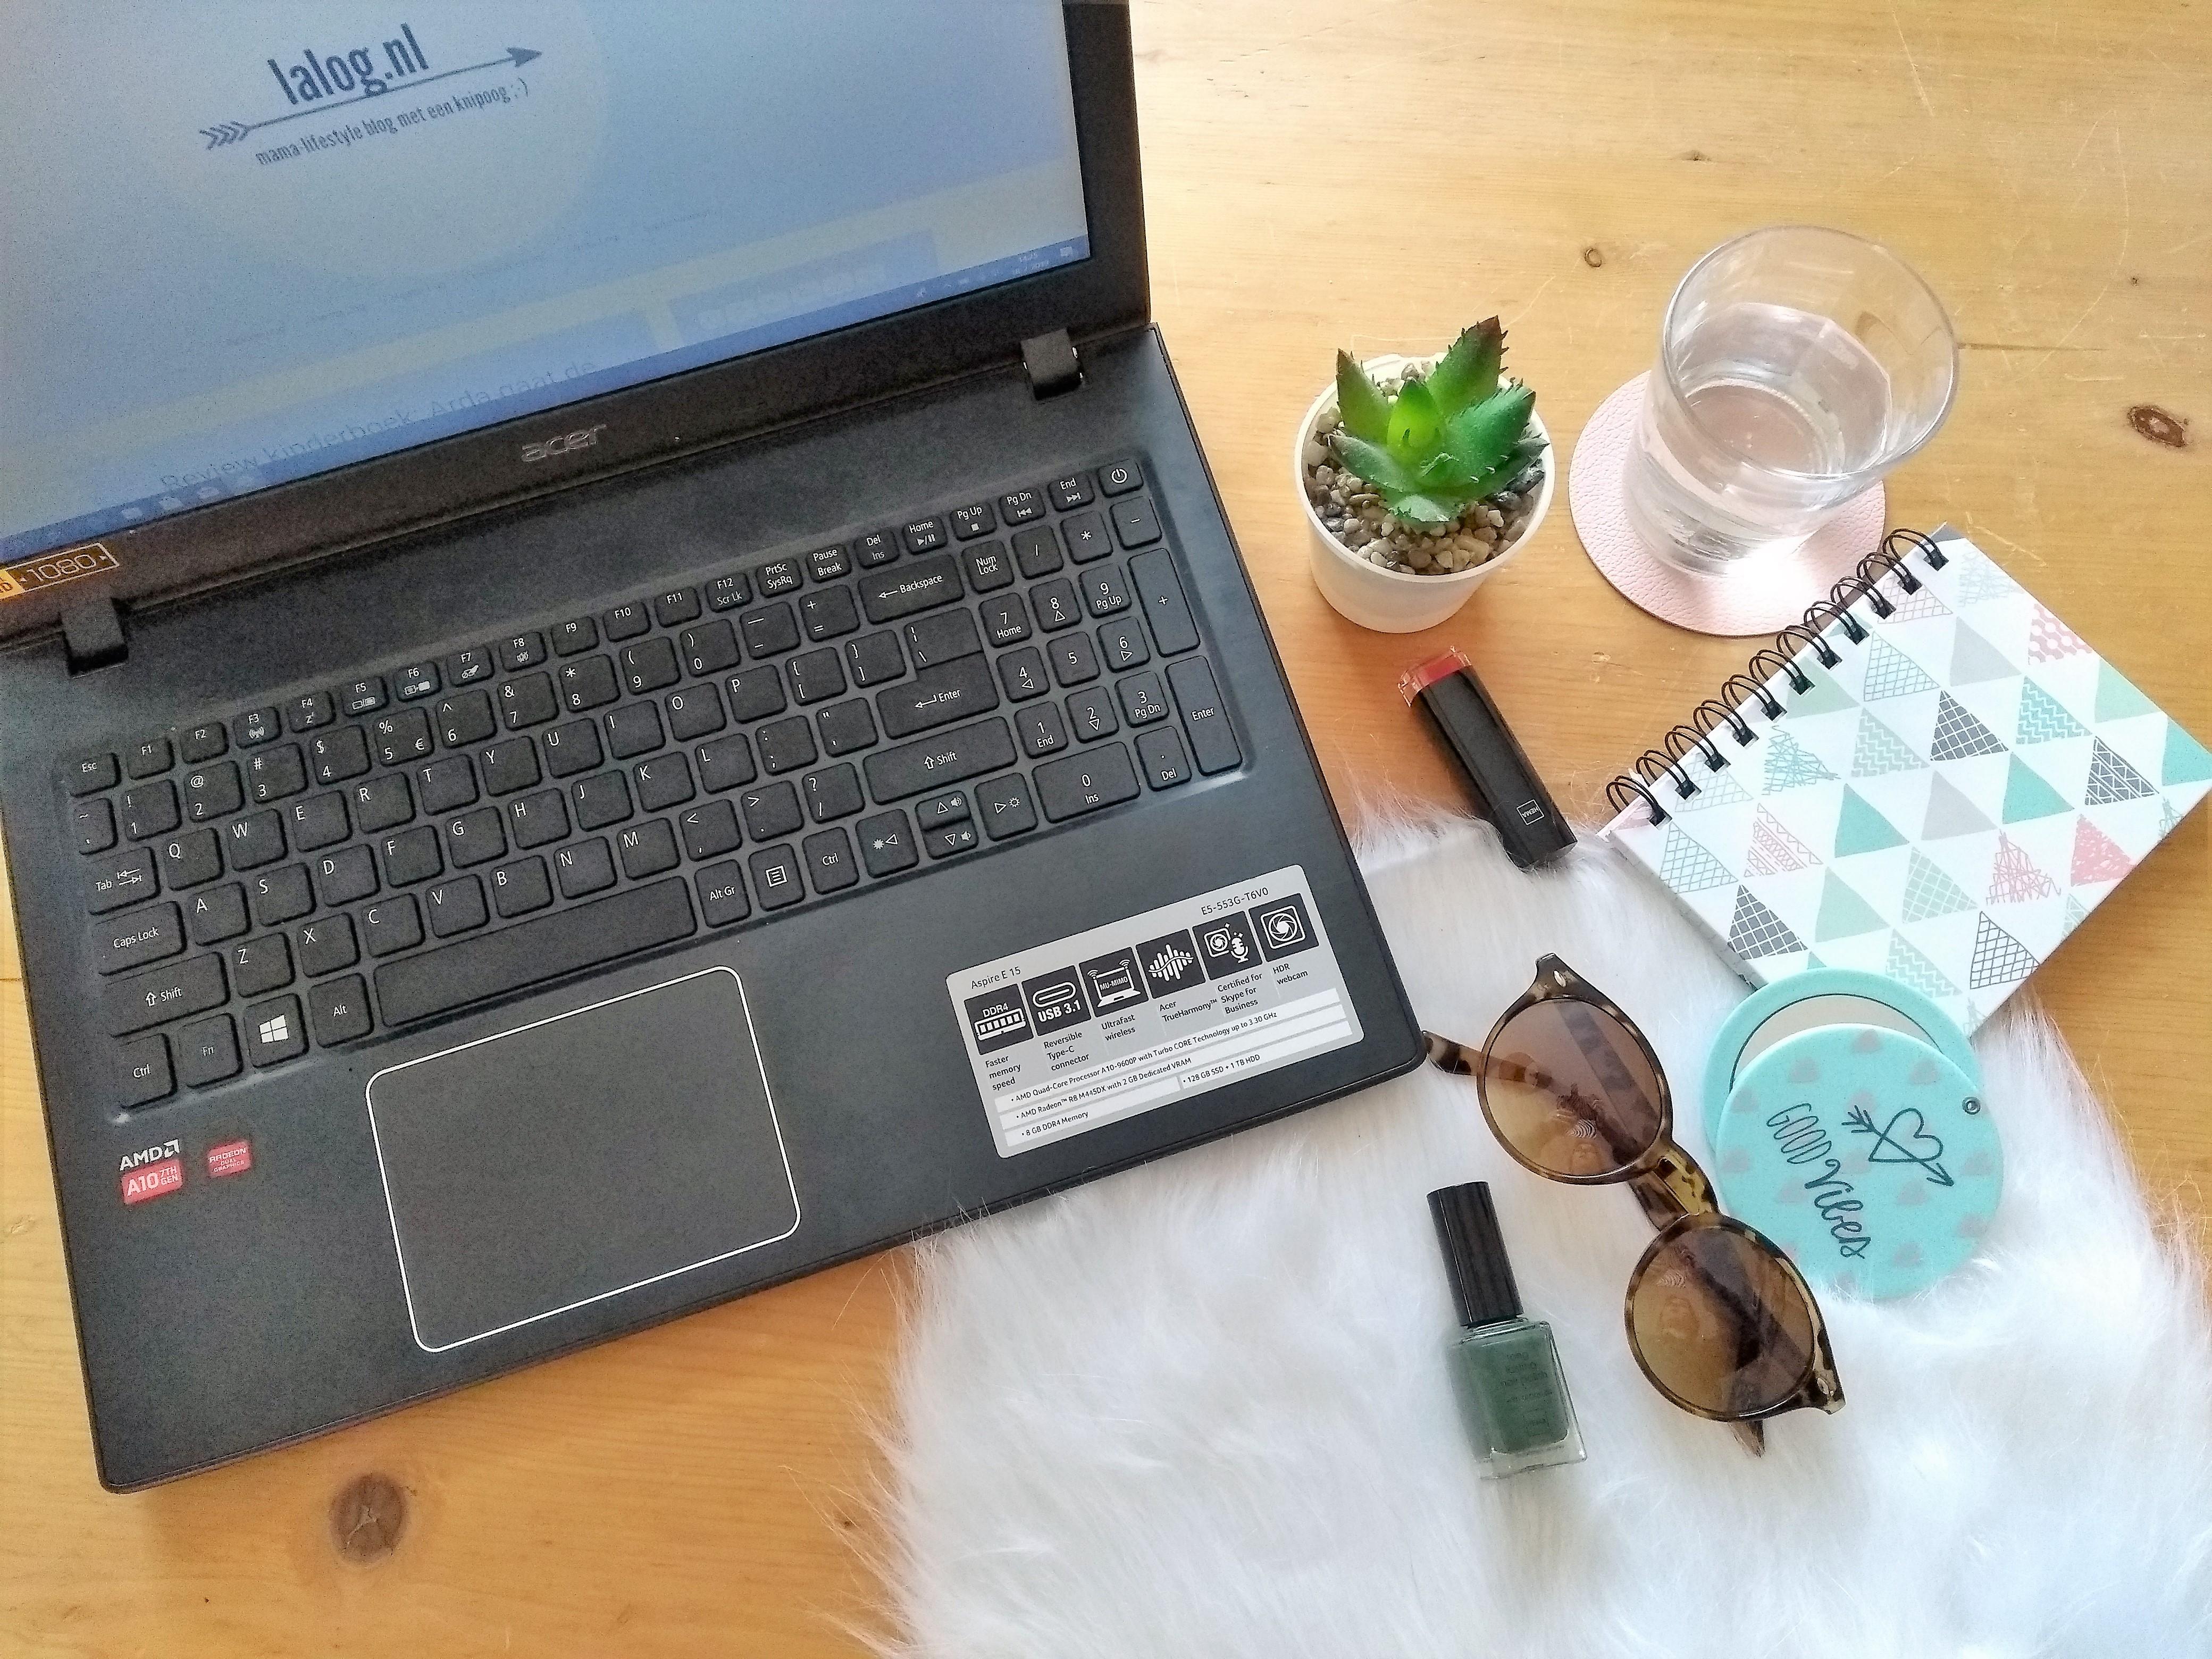 flatlaylalognl, lalog.nl, lalogblog, mamablog, lifestyleblog, blog, flatlay, laptop